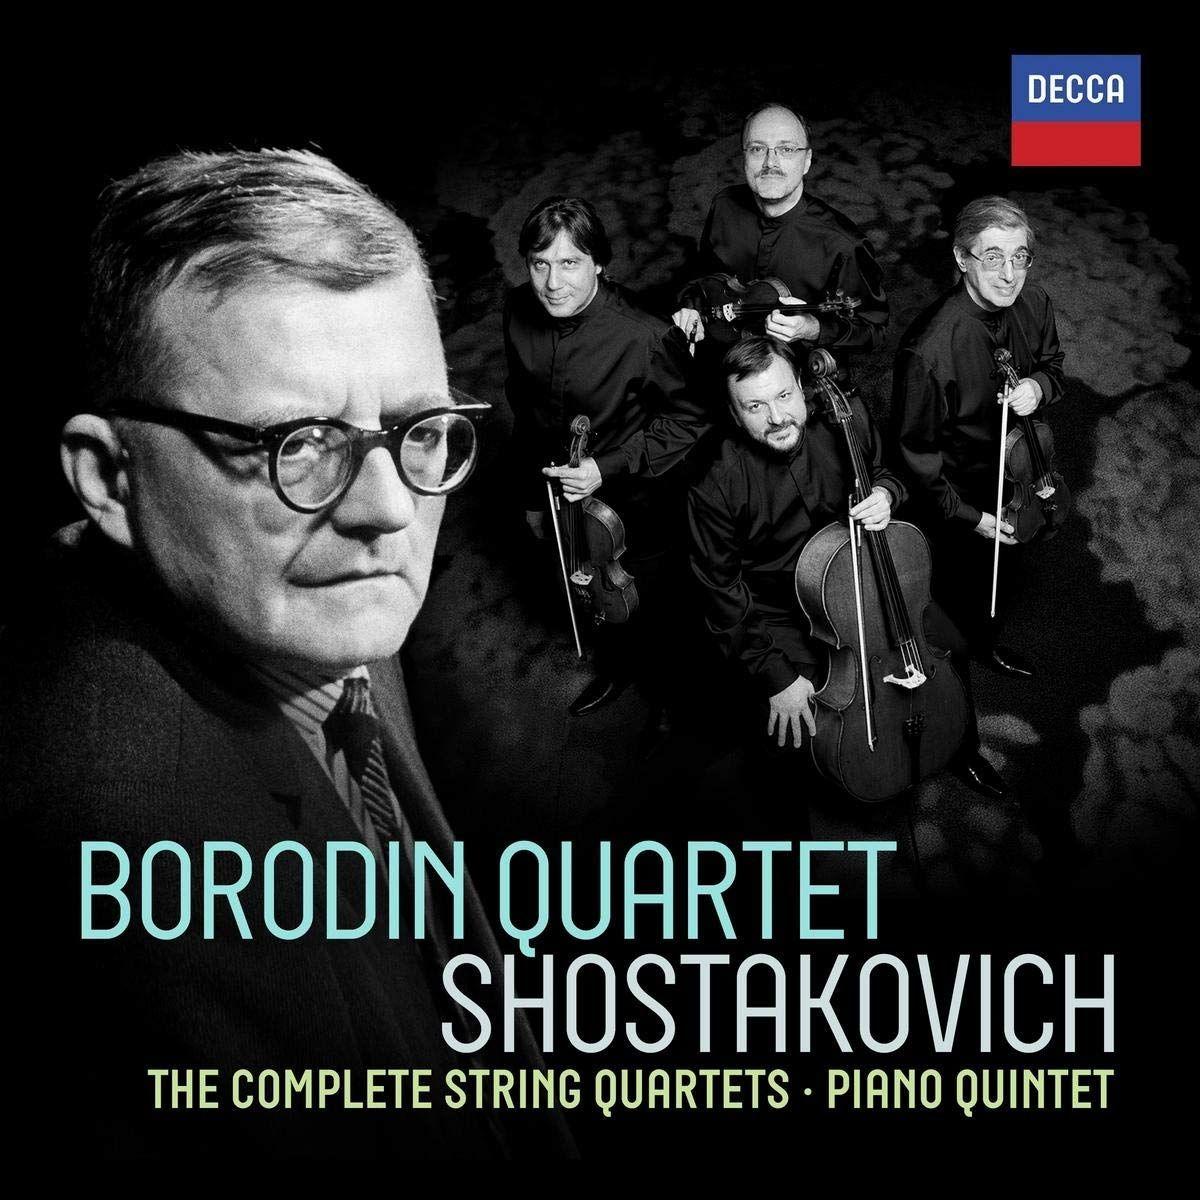 Дмитрий Шостакович Borodin Quartet. Shostakovich. Complete String Quartets a reichel string quartet in c major op 8